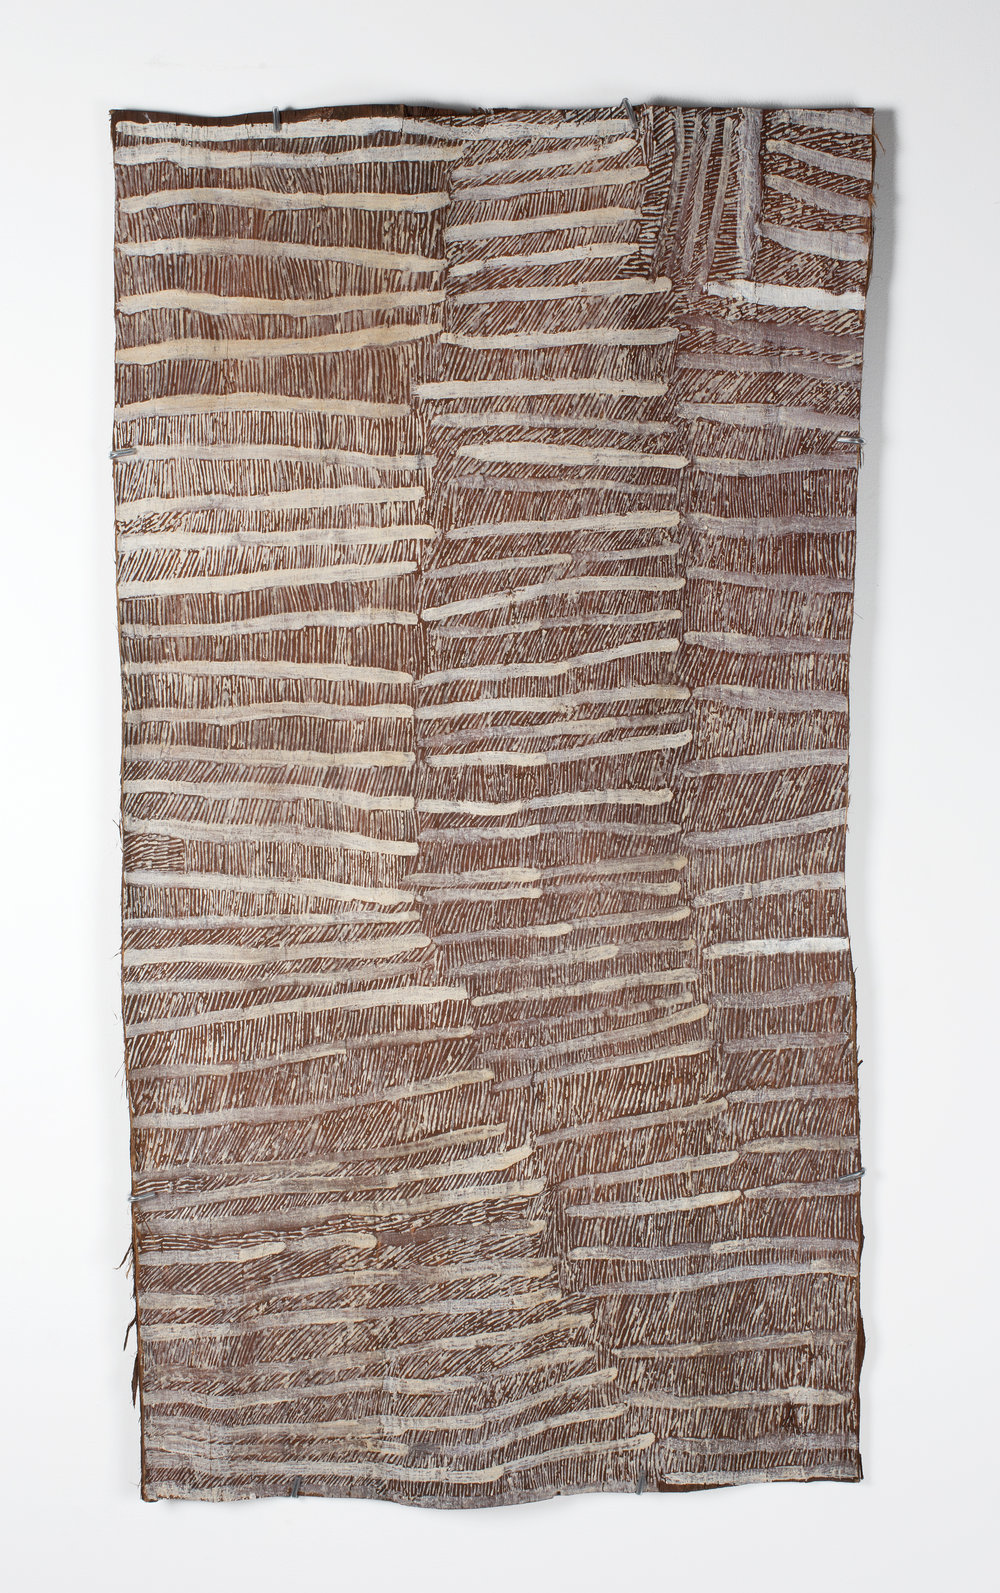 Nyapanyapa Yunupingu,Untitled, 2016, bark painting, 122 x 64 cm. Courtesy the artist and Roslyn Oxley9 Gallery, Sydney.